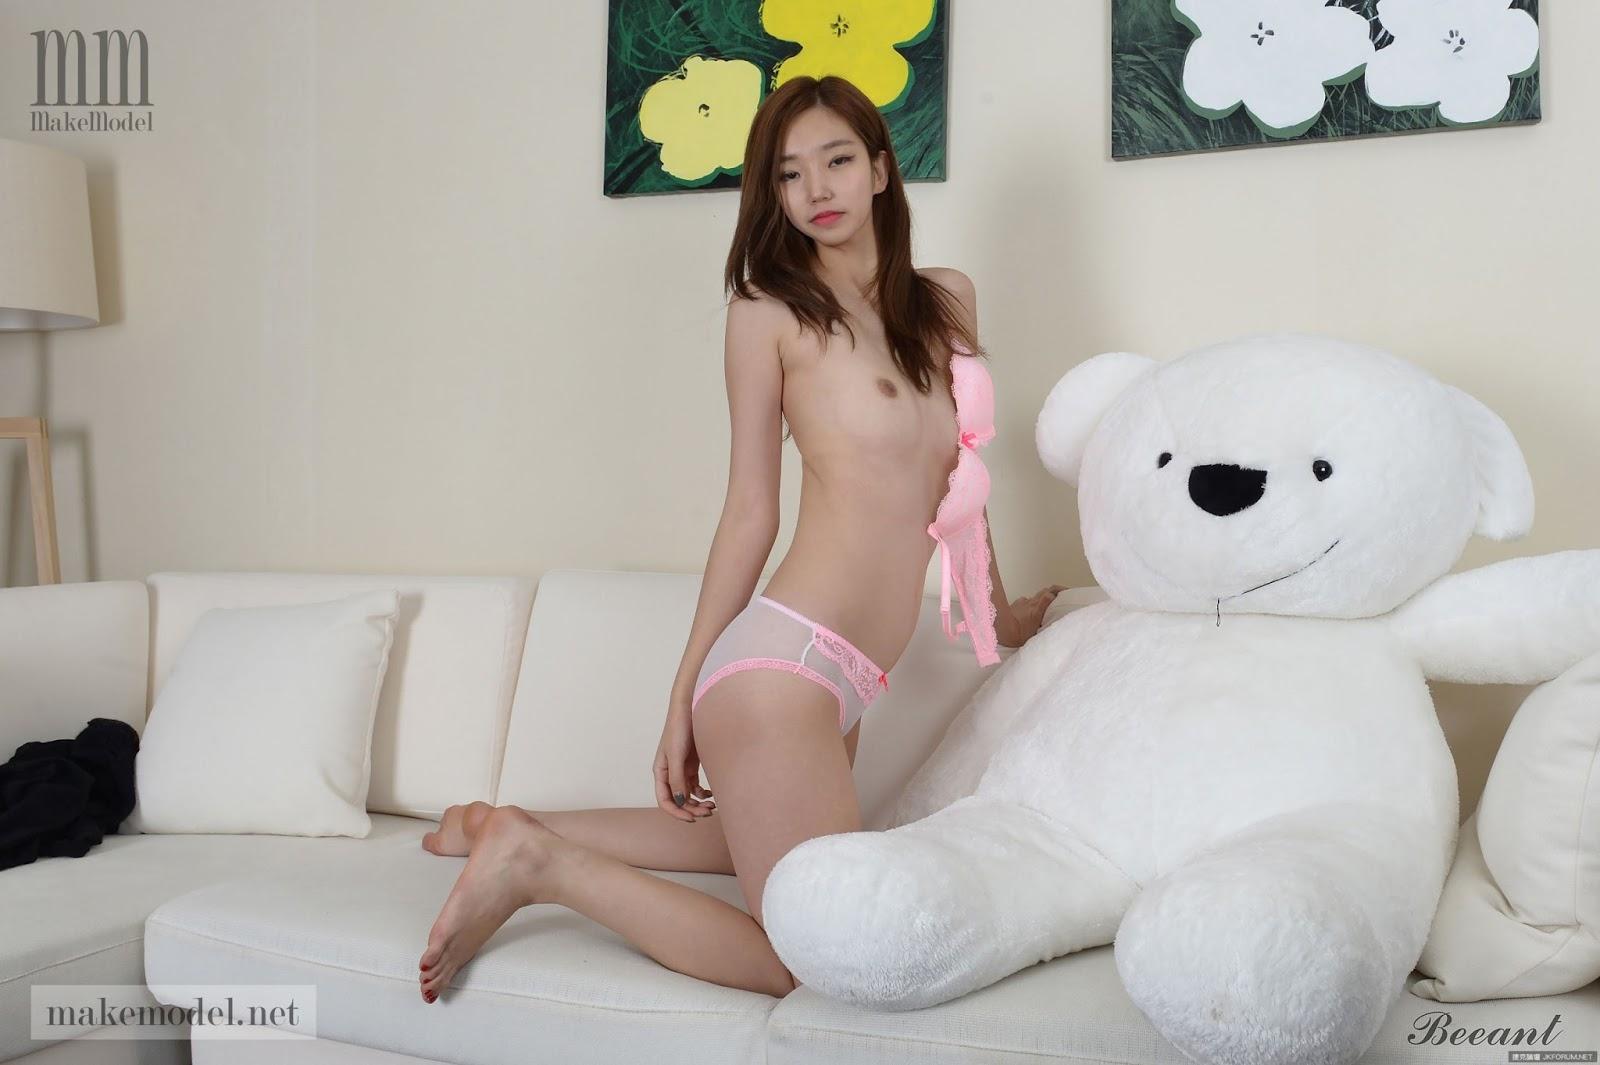 270912 3453 - Korean Nude - Big Albom Remain #A-korean girl